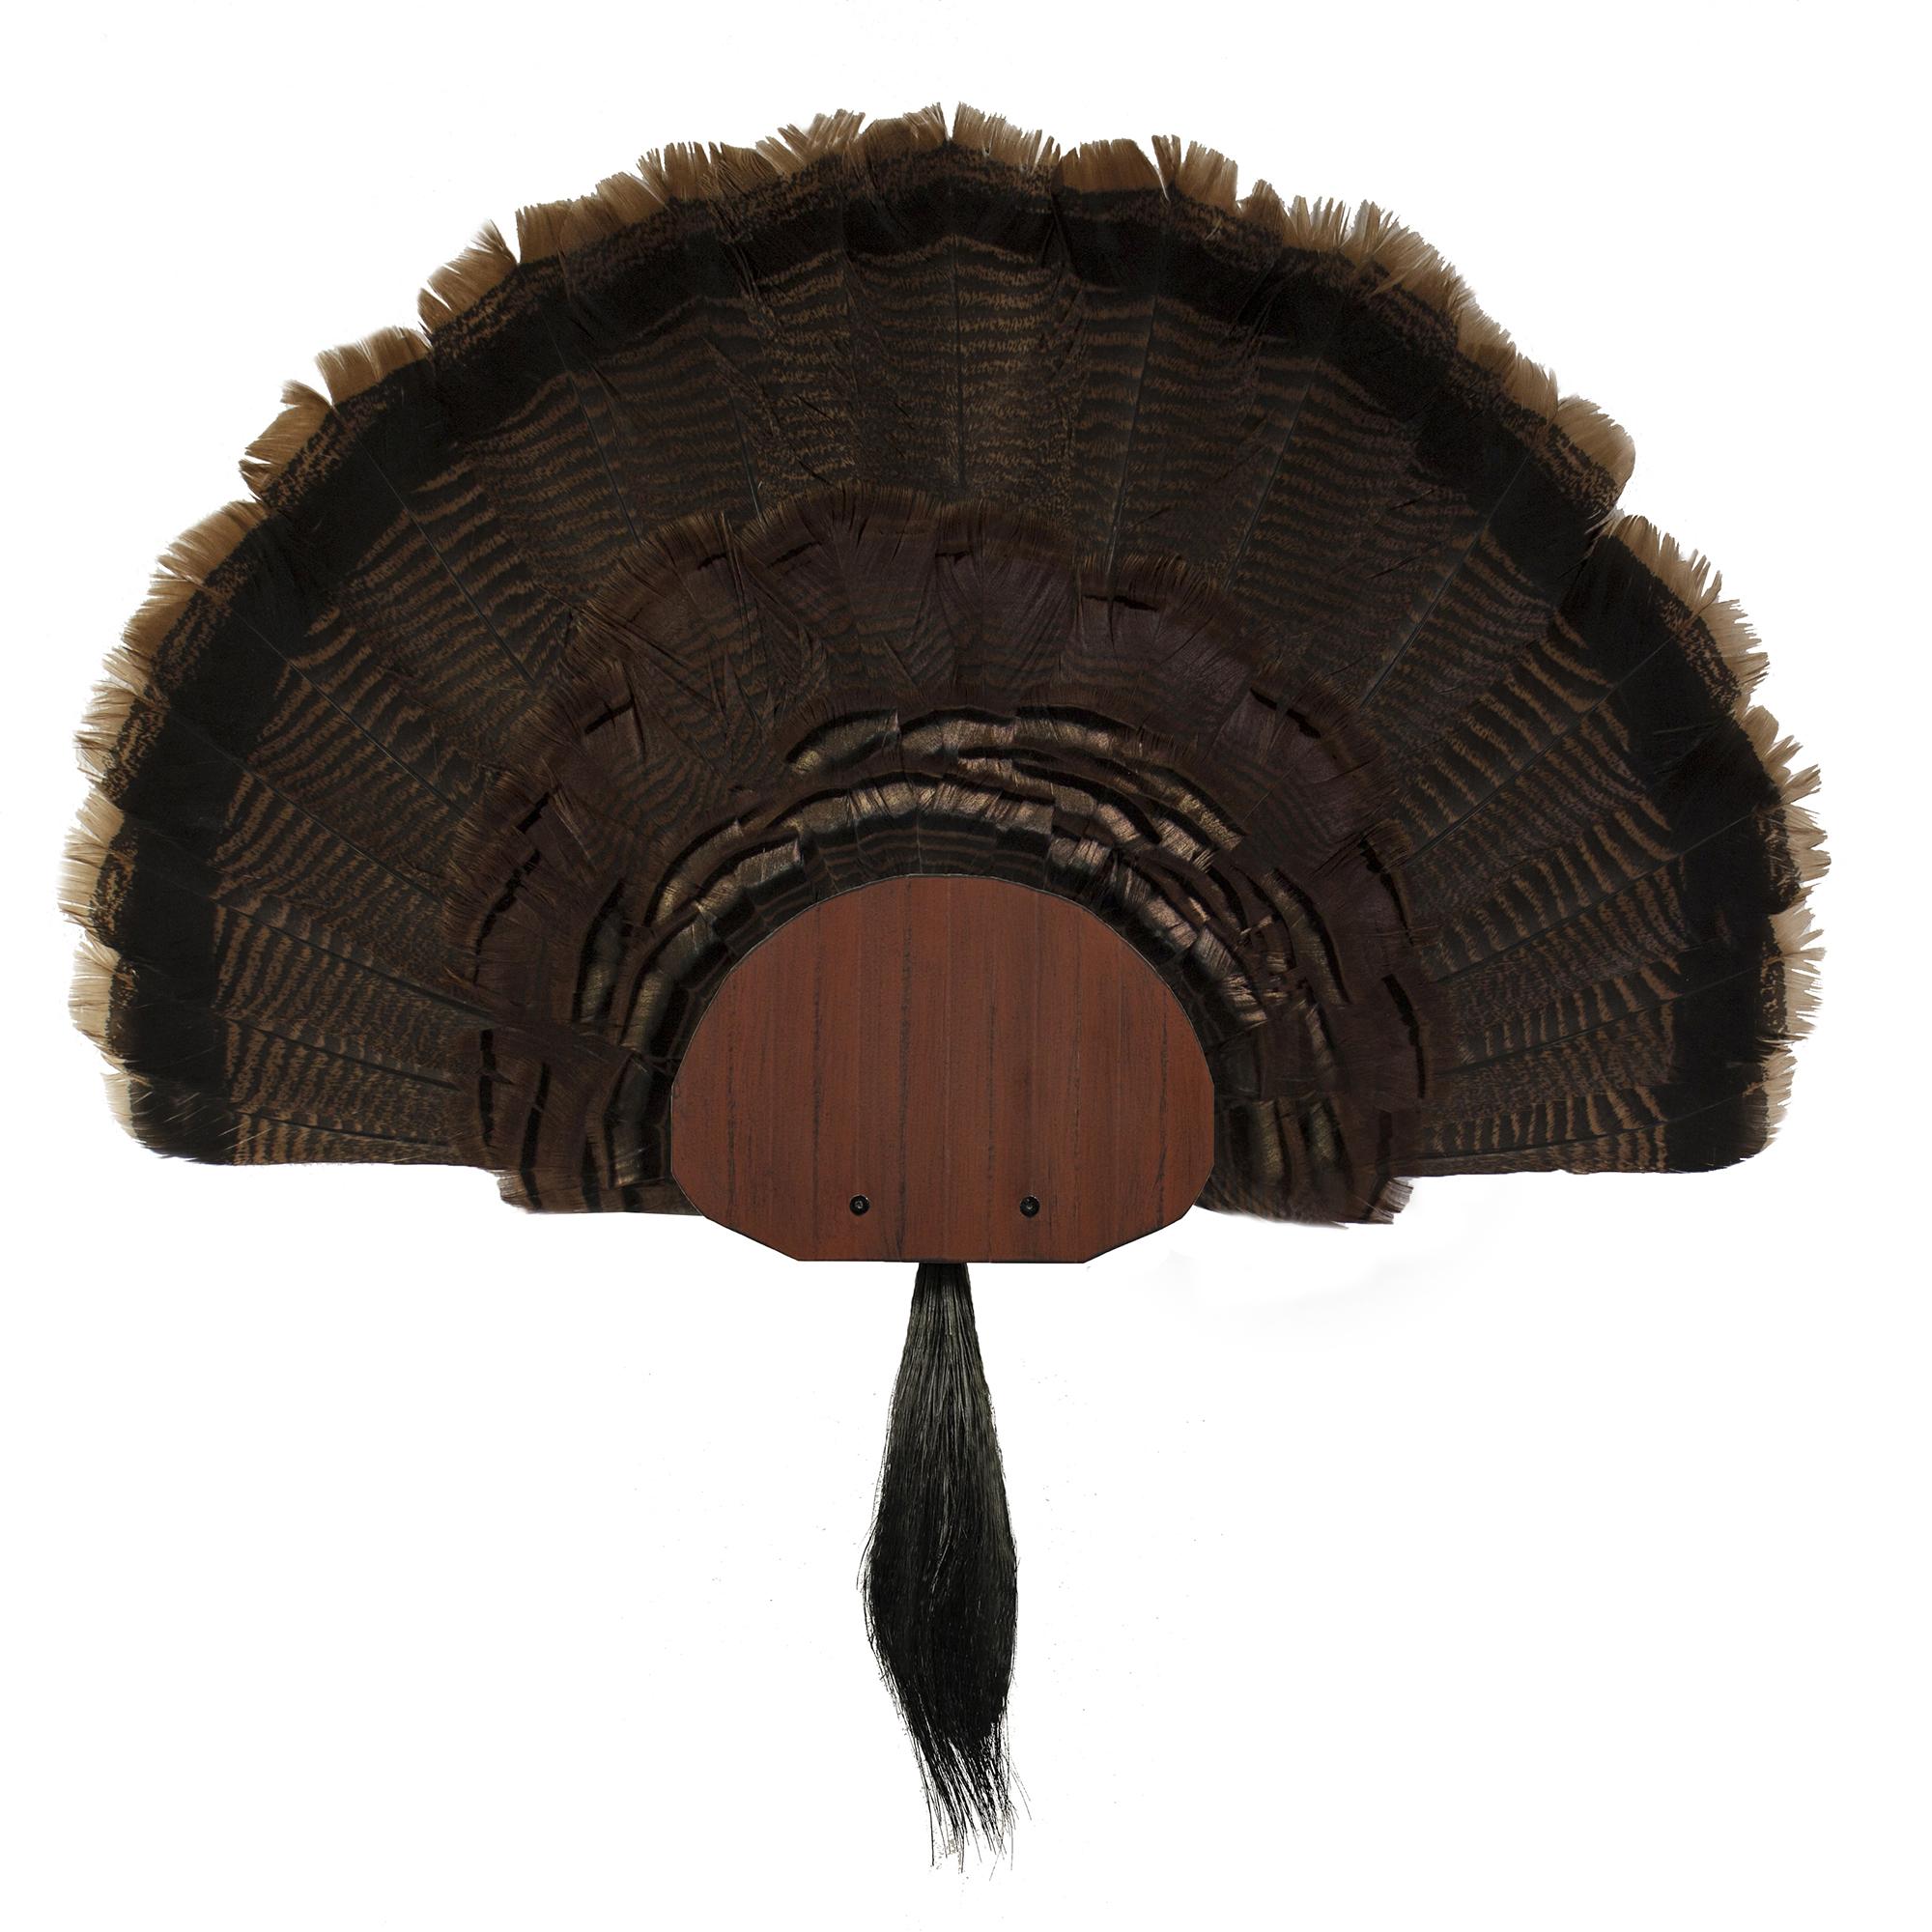 Walnut Hollow Metal Turkey Mounting Kit, Red